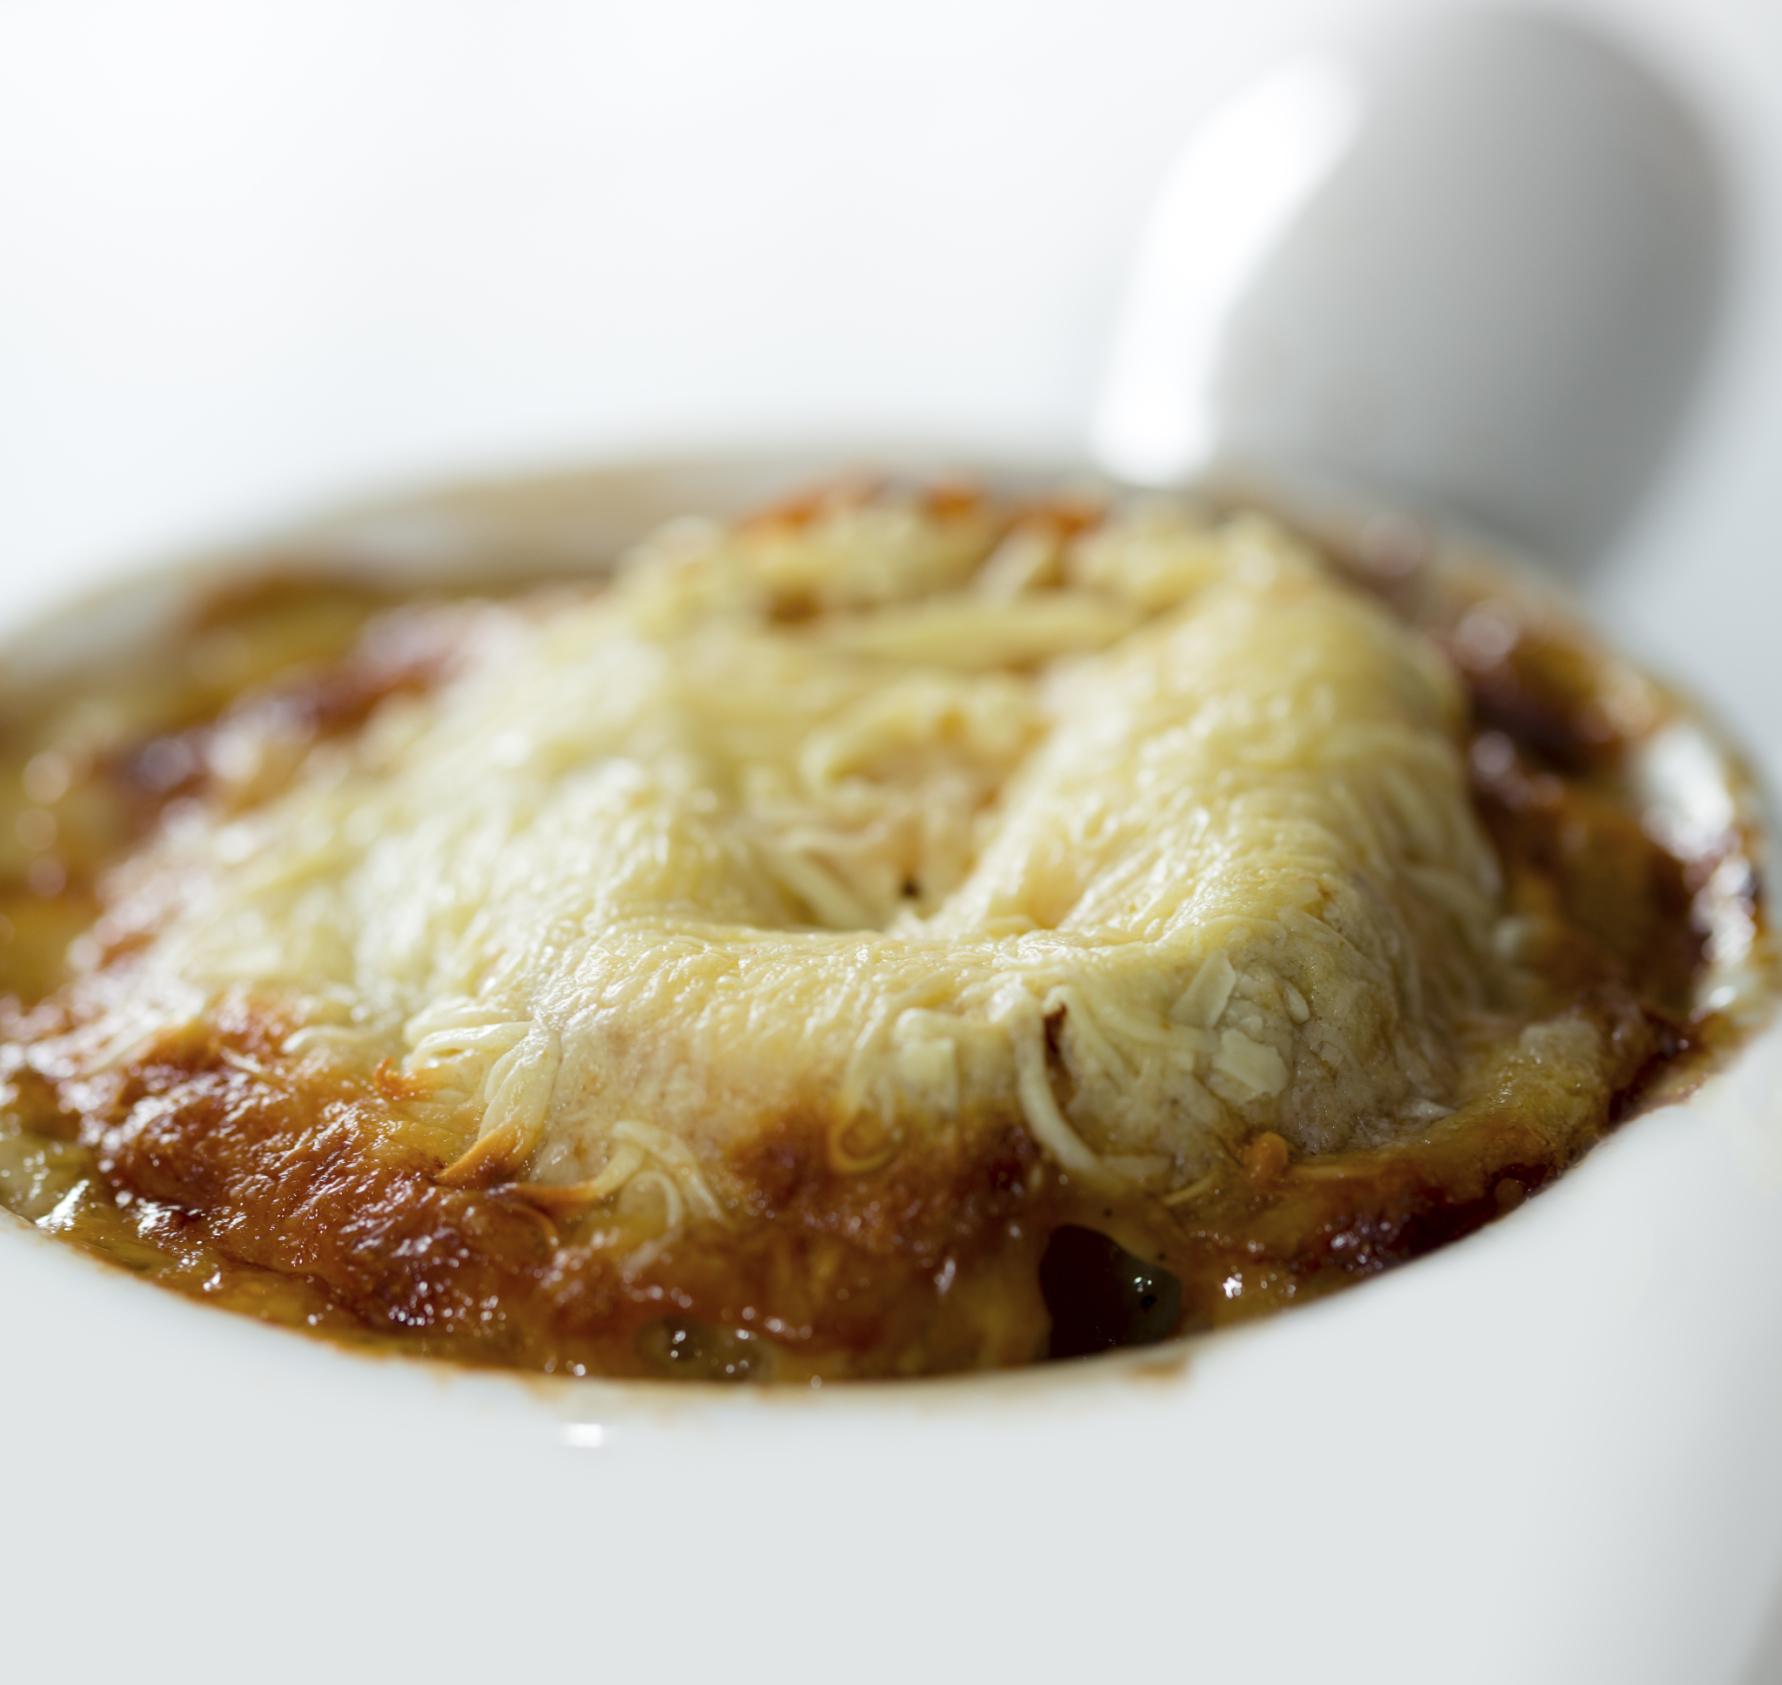 Sopa de cebolla clásica francesa